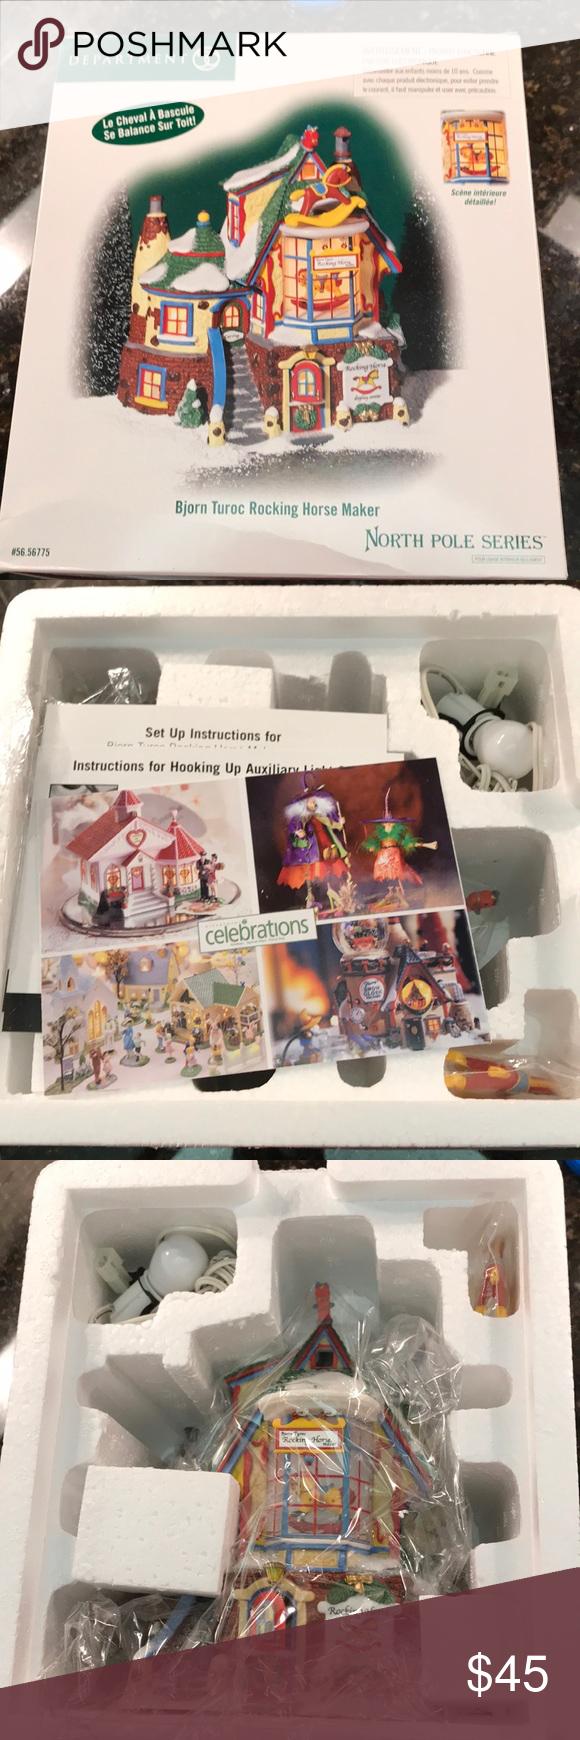 Department 56- North Pole Series. New in box. Bjorn Turoc Rocking Horse Maker village piece for North Pole Series. New in box. Has never been out of box. department 56 Holiday Holiday Decor #department56